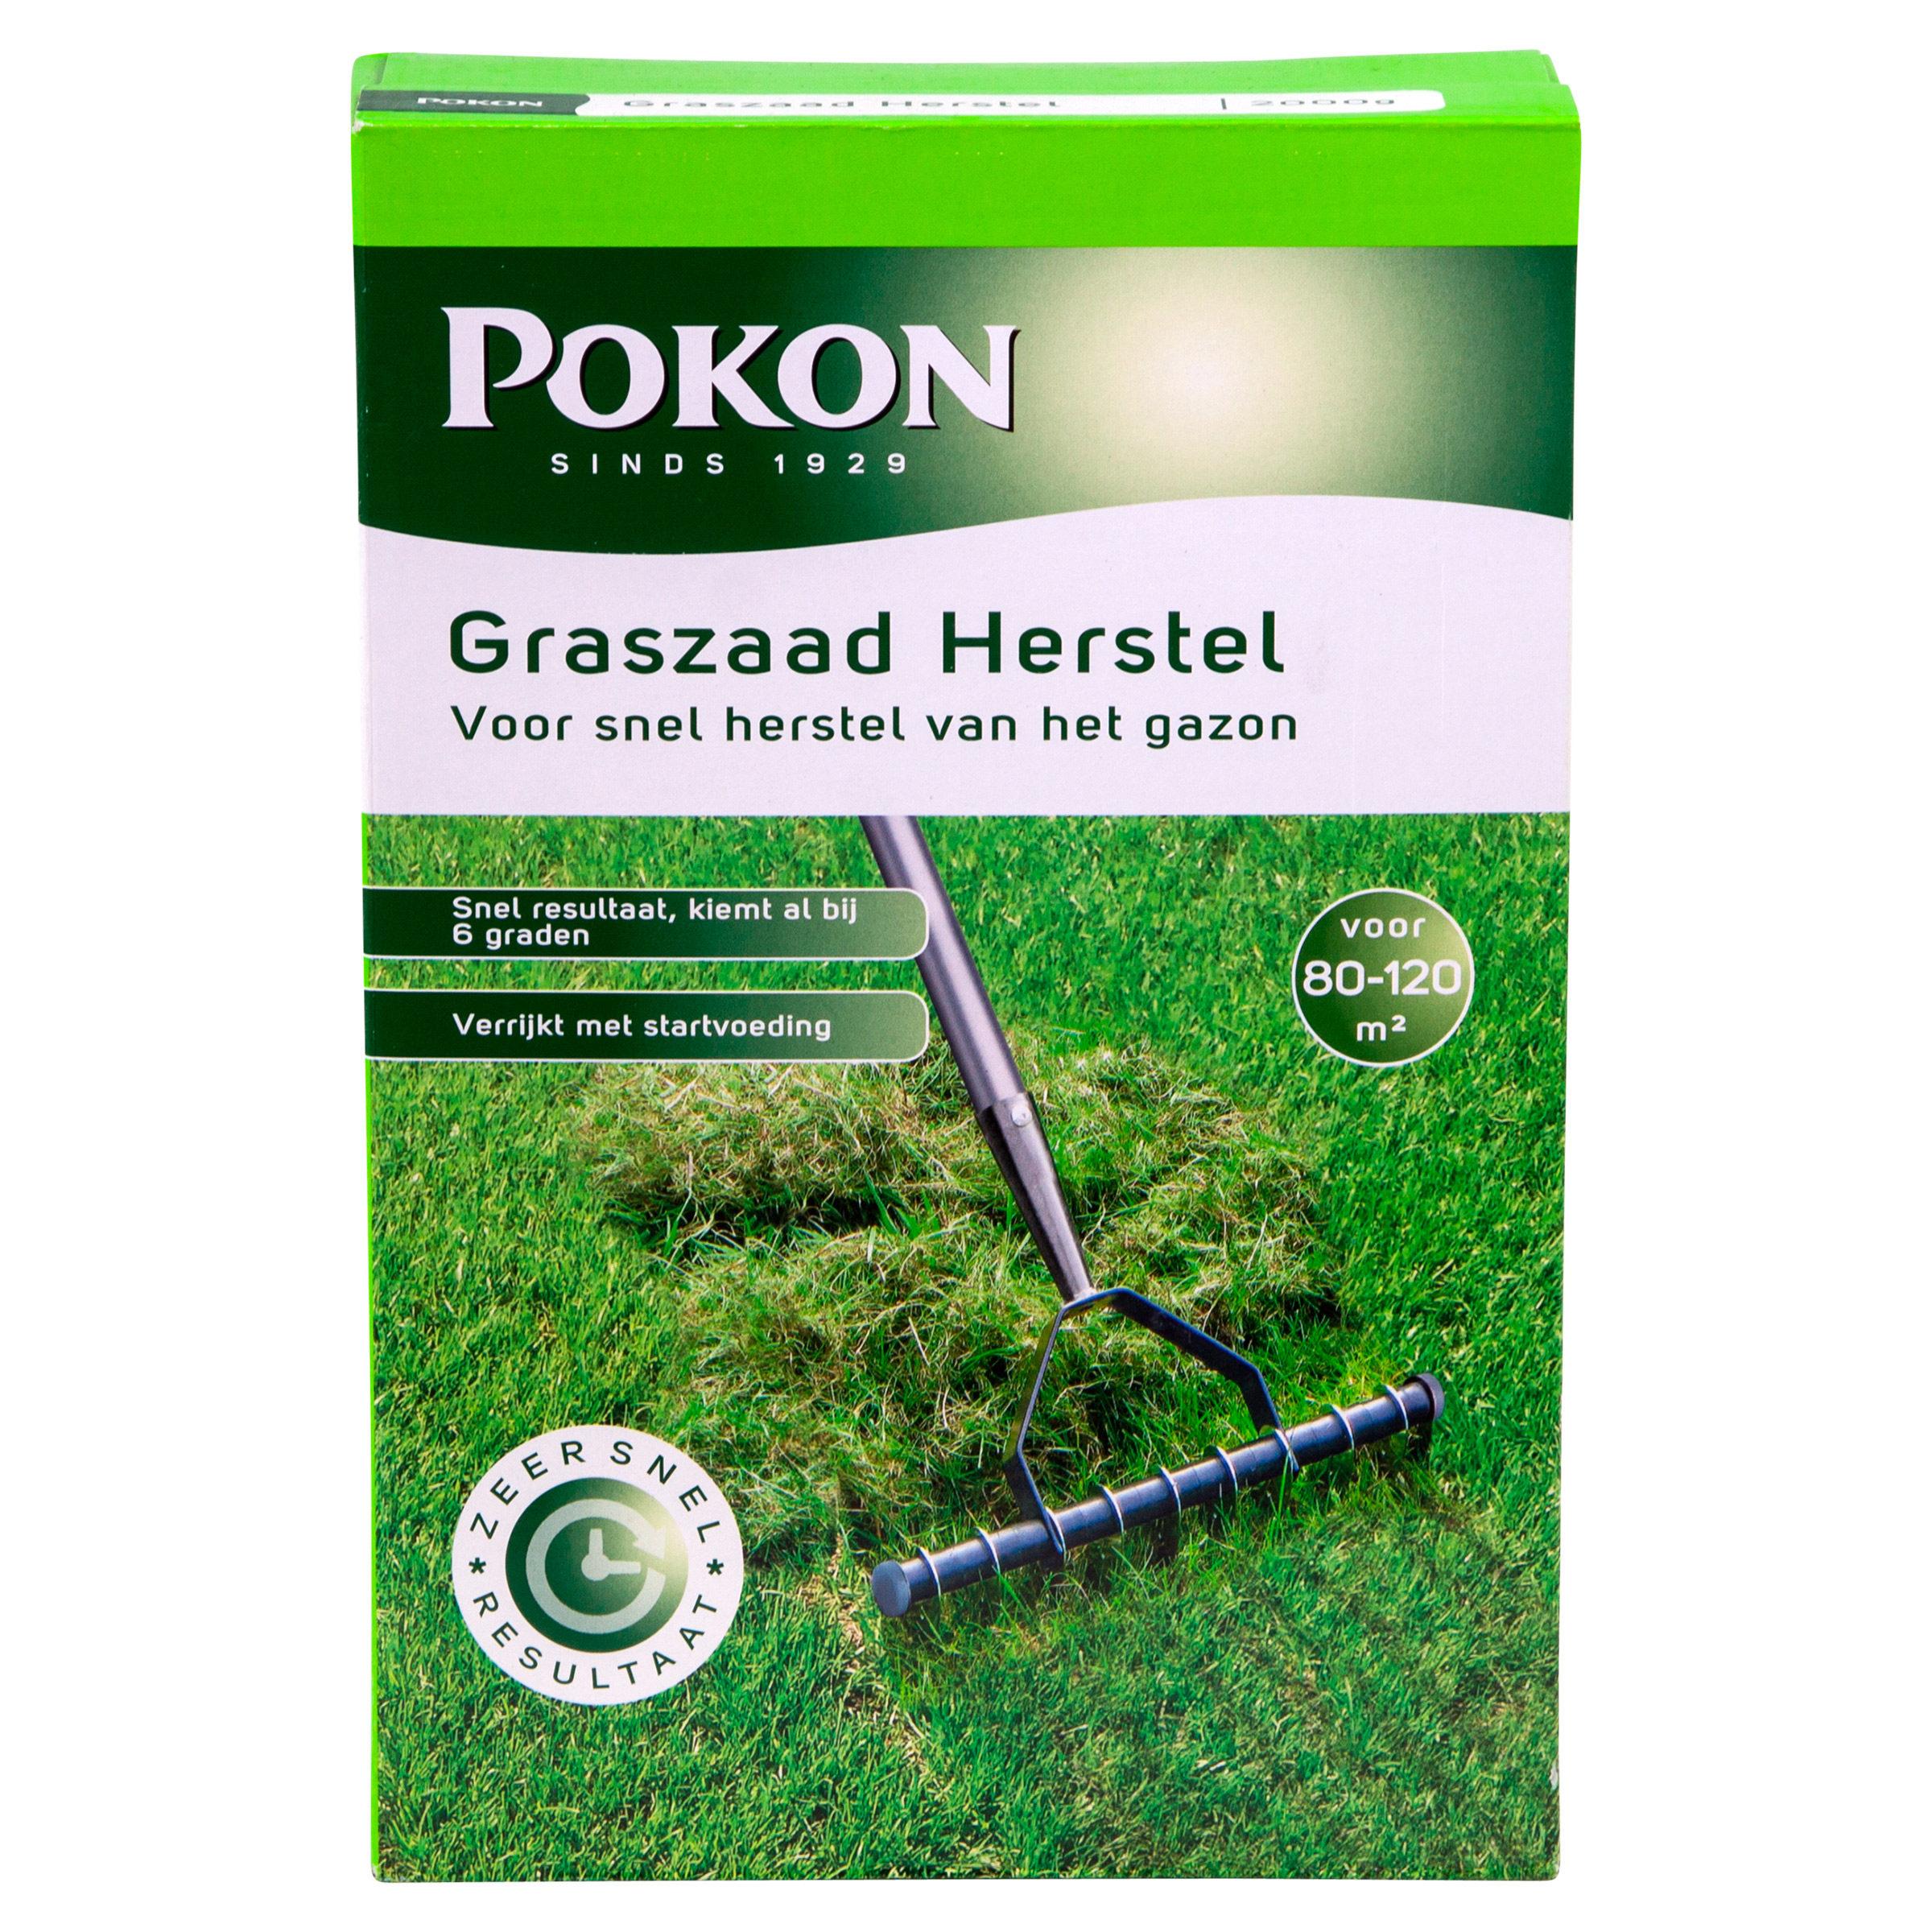 Pokon Graszaad Herstel SOS 2kg - cover